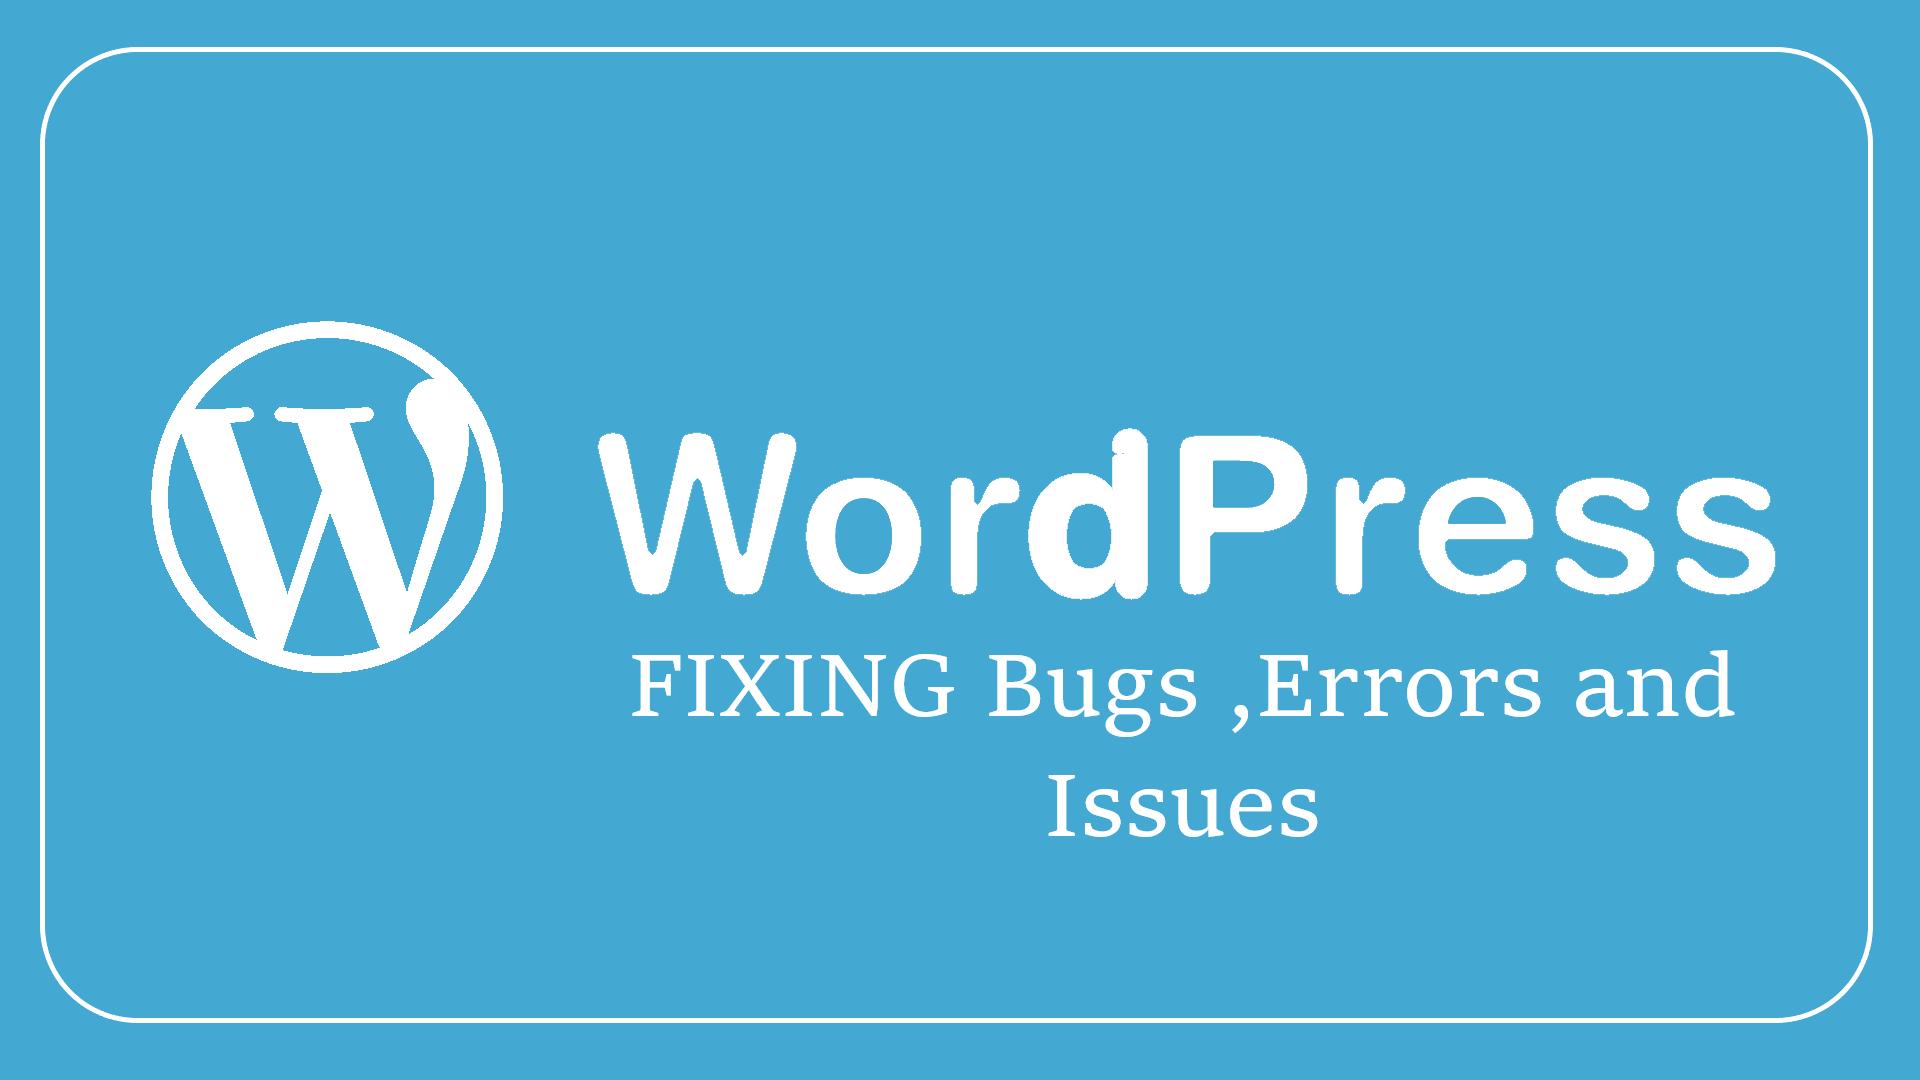 Fix up your wordpress bugs